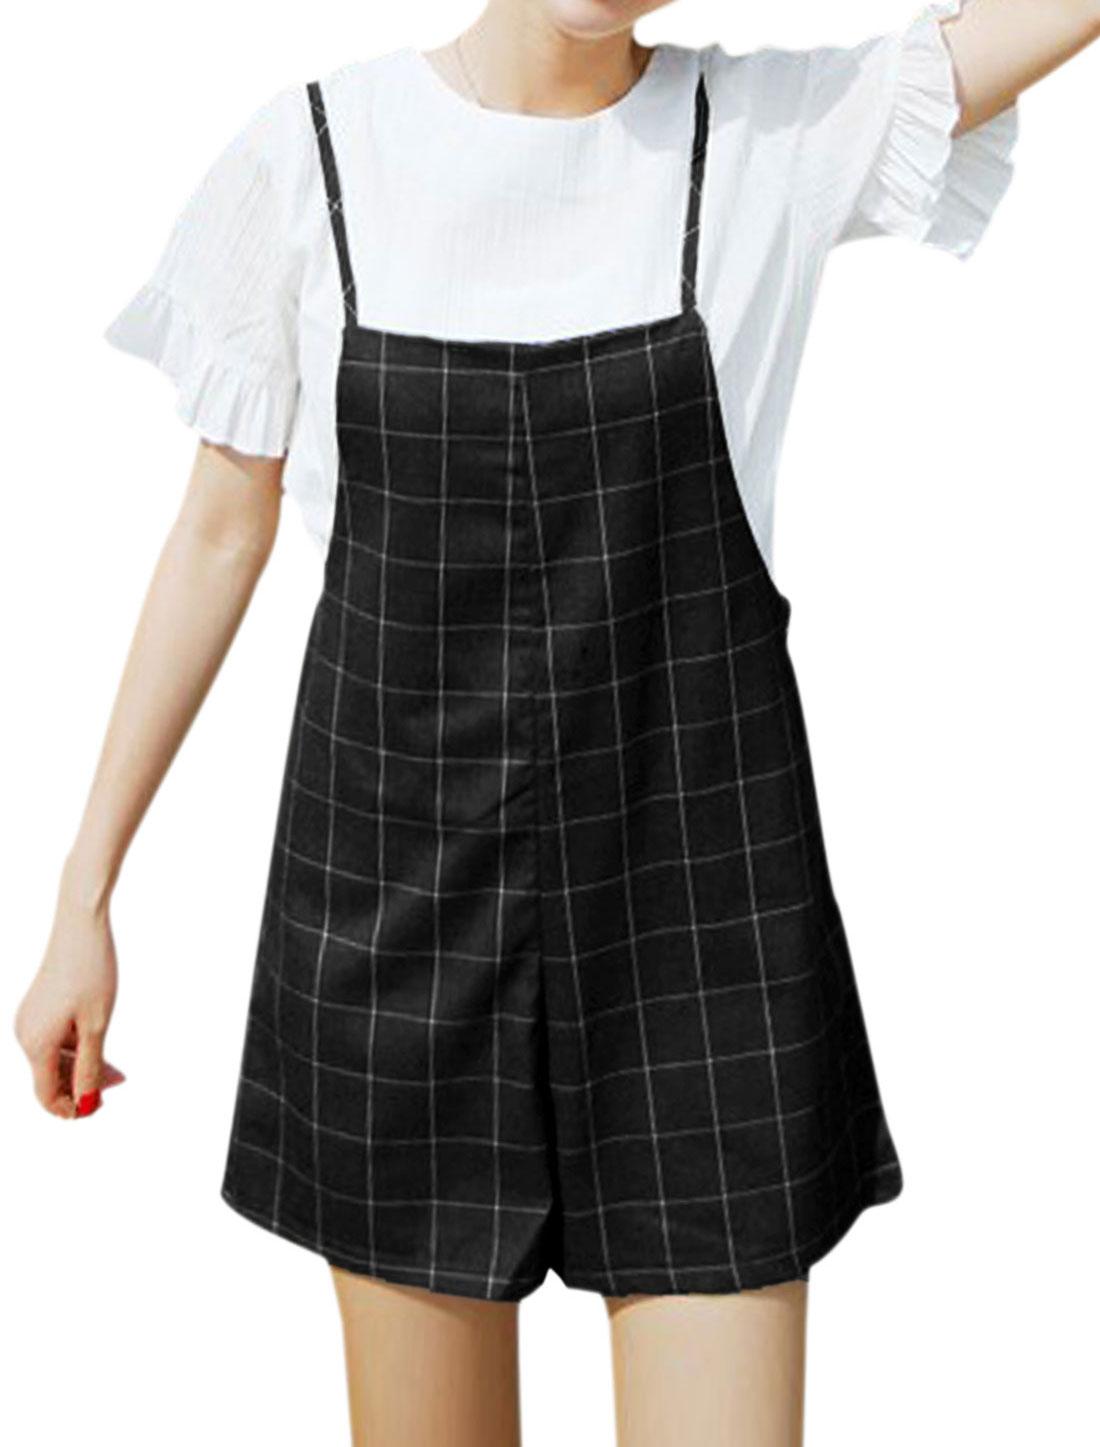 Women Spaghetti Straps Leisure Plaids Suspender Shorts Black S